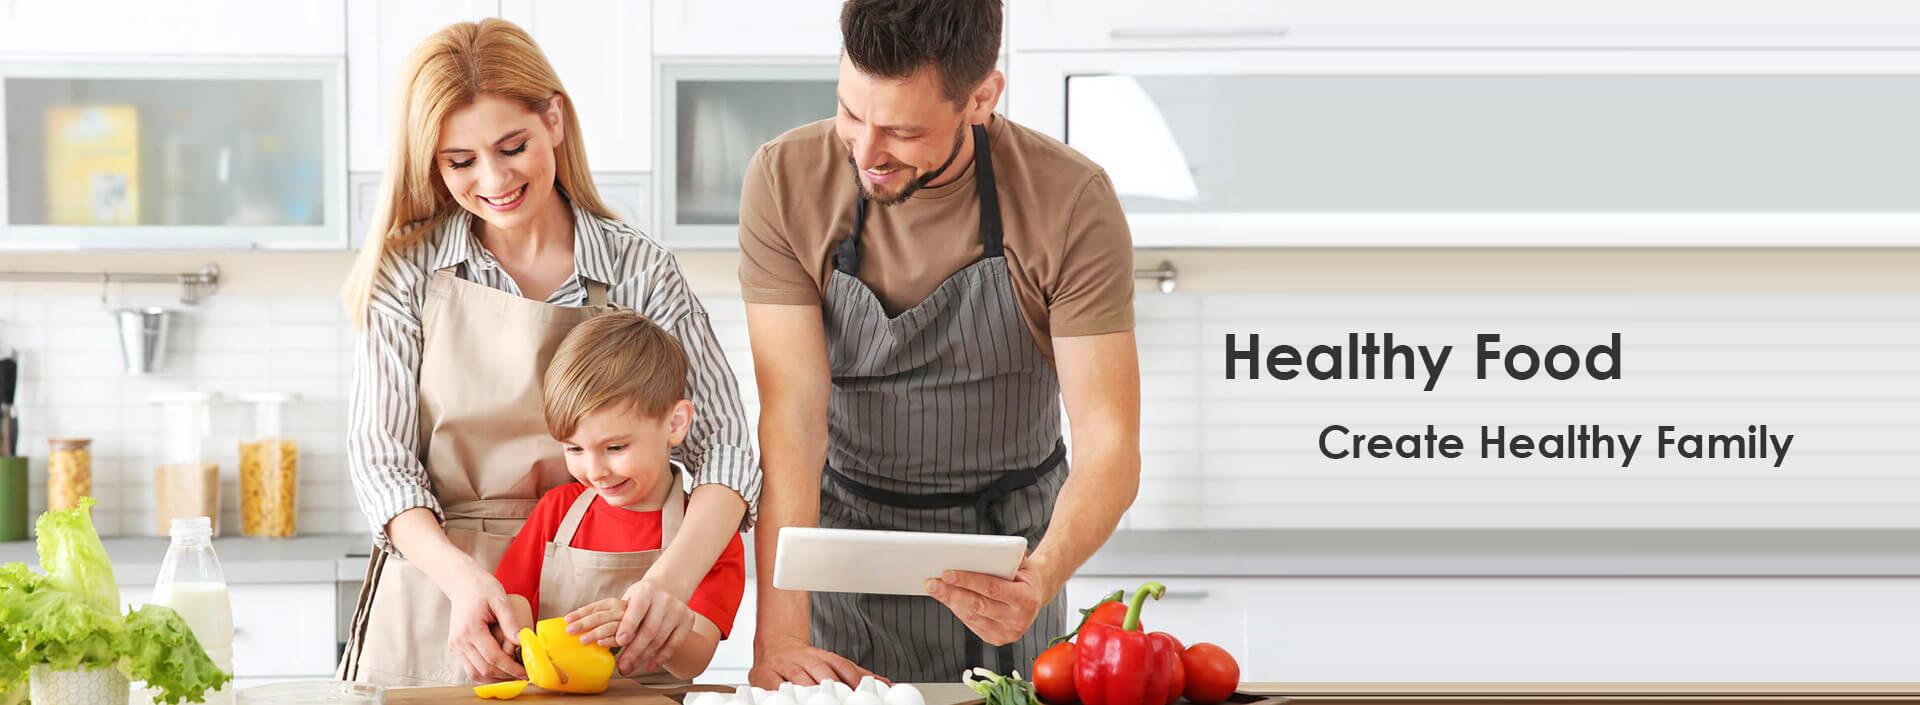 Healthy Food creat healthy family